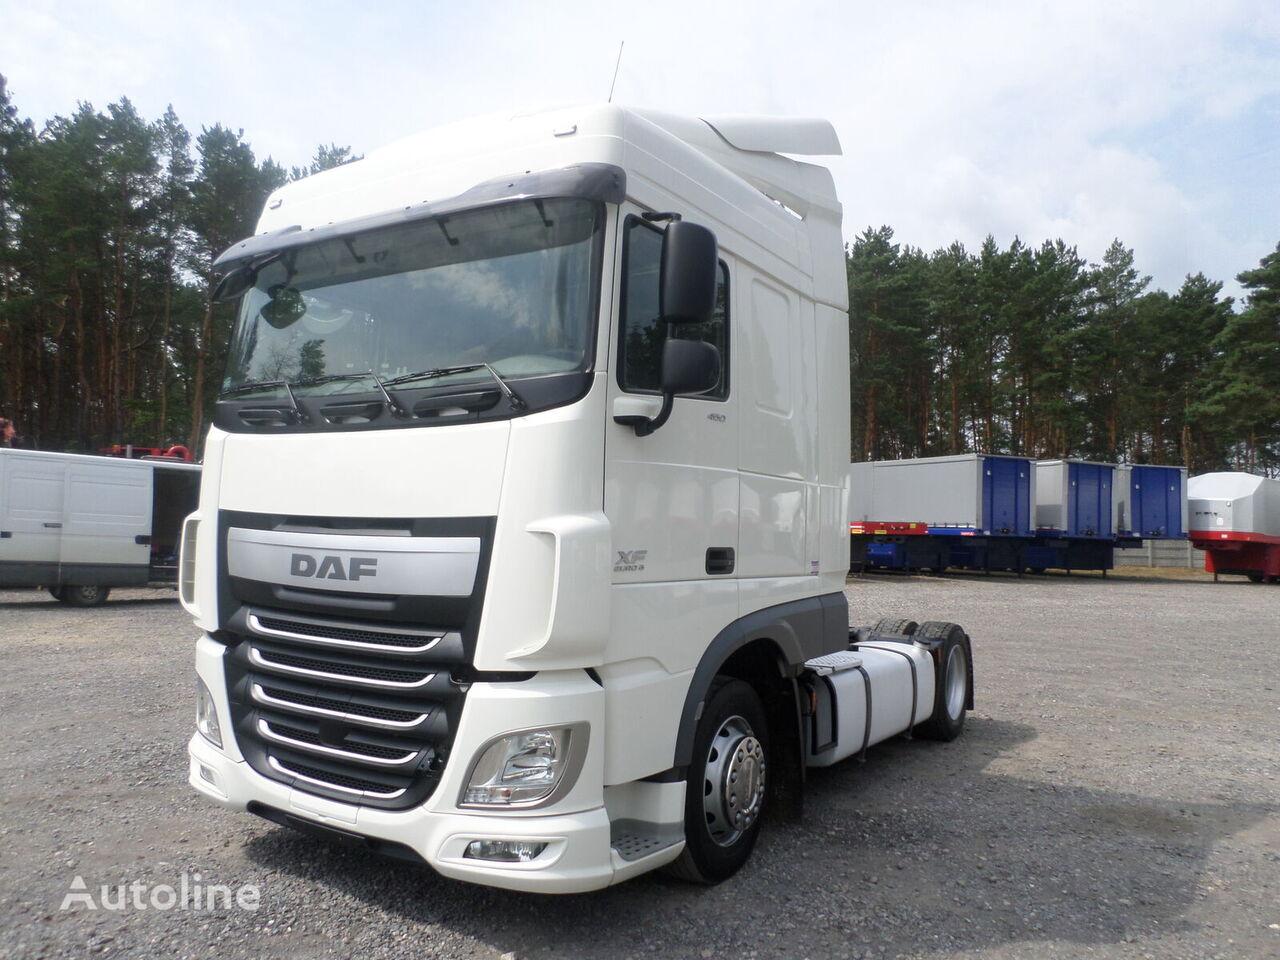 DAF XF 106 460 * EURO 6 * SPACE CAB * AUTOMAT * LOW DECK * MEGA tractor unit